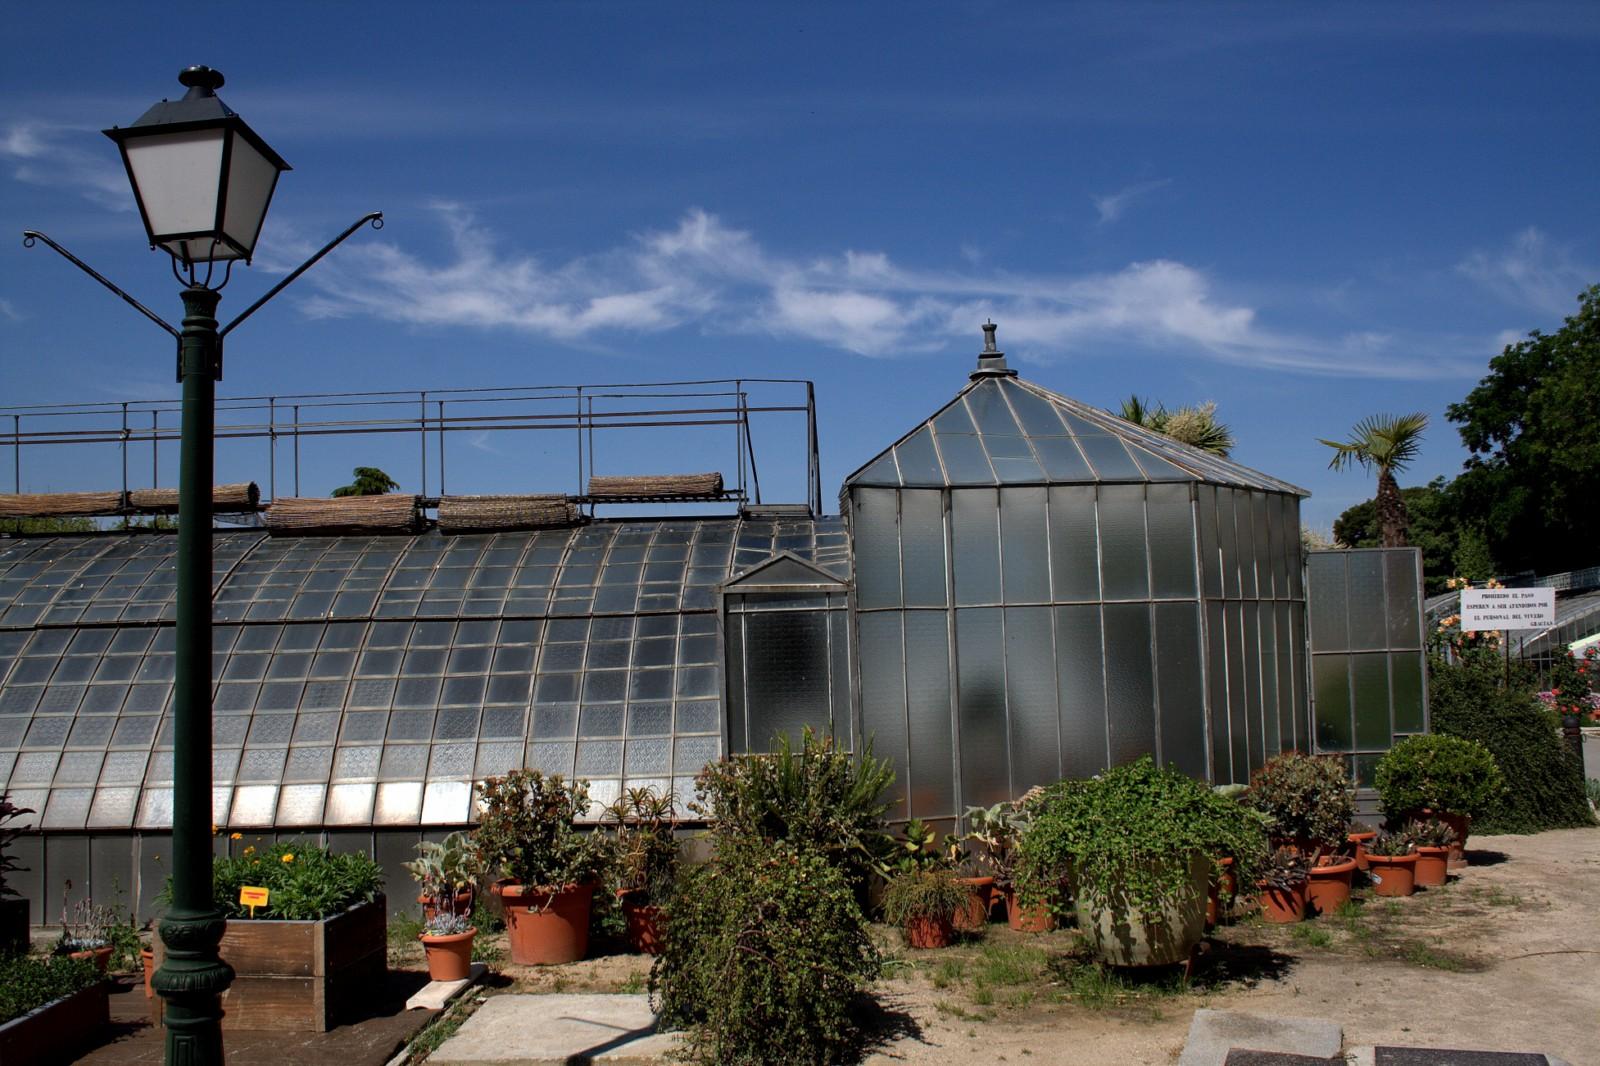 Fotoblog madrid las estufas del retiro - Invernadero de cristal ...